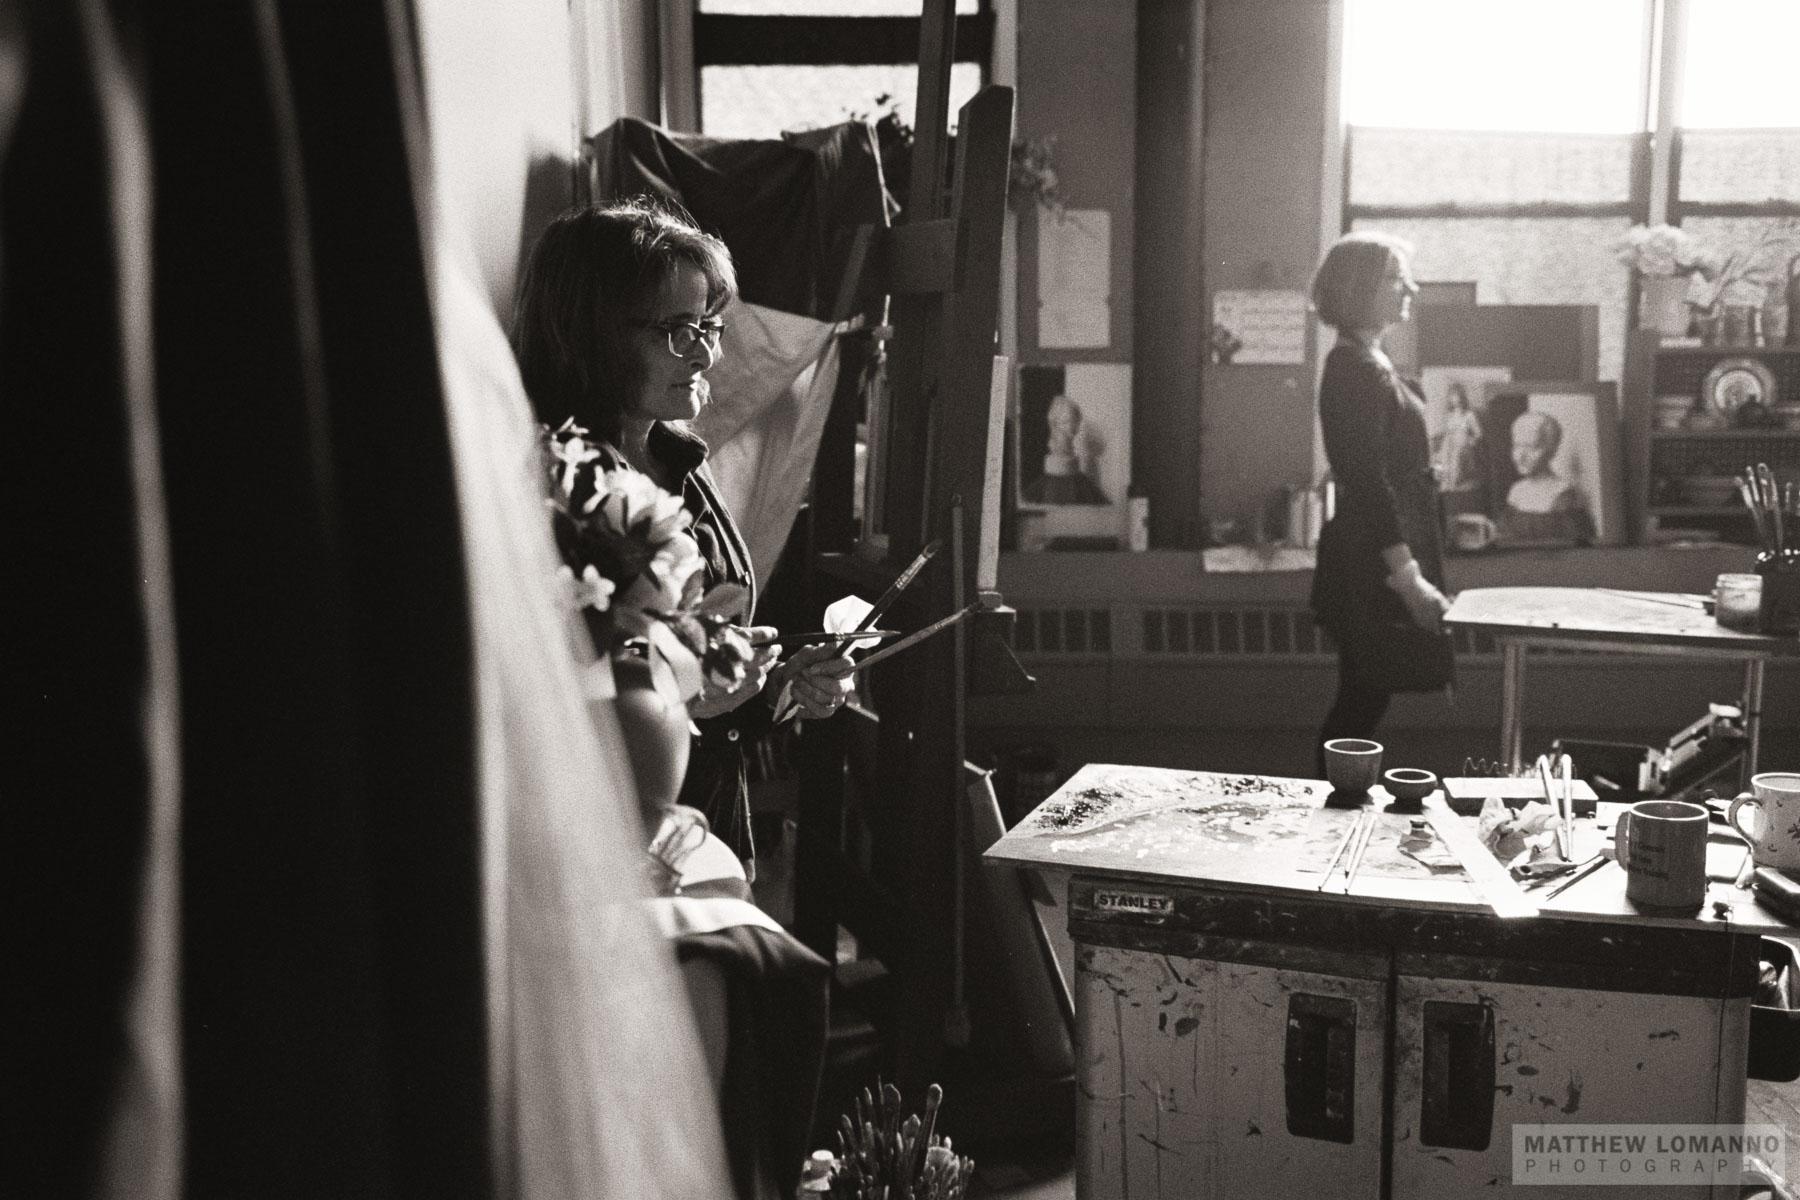 Ingbretson_atelier_working_by_Lomanno-12.jpg